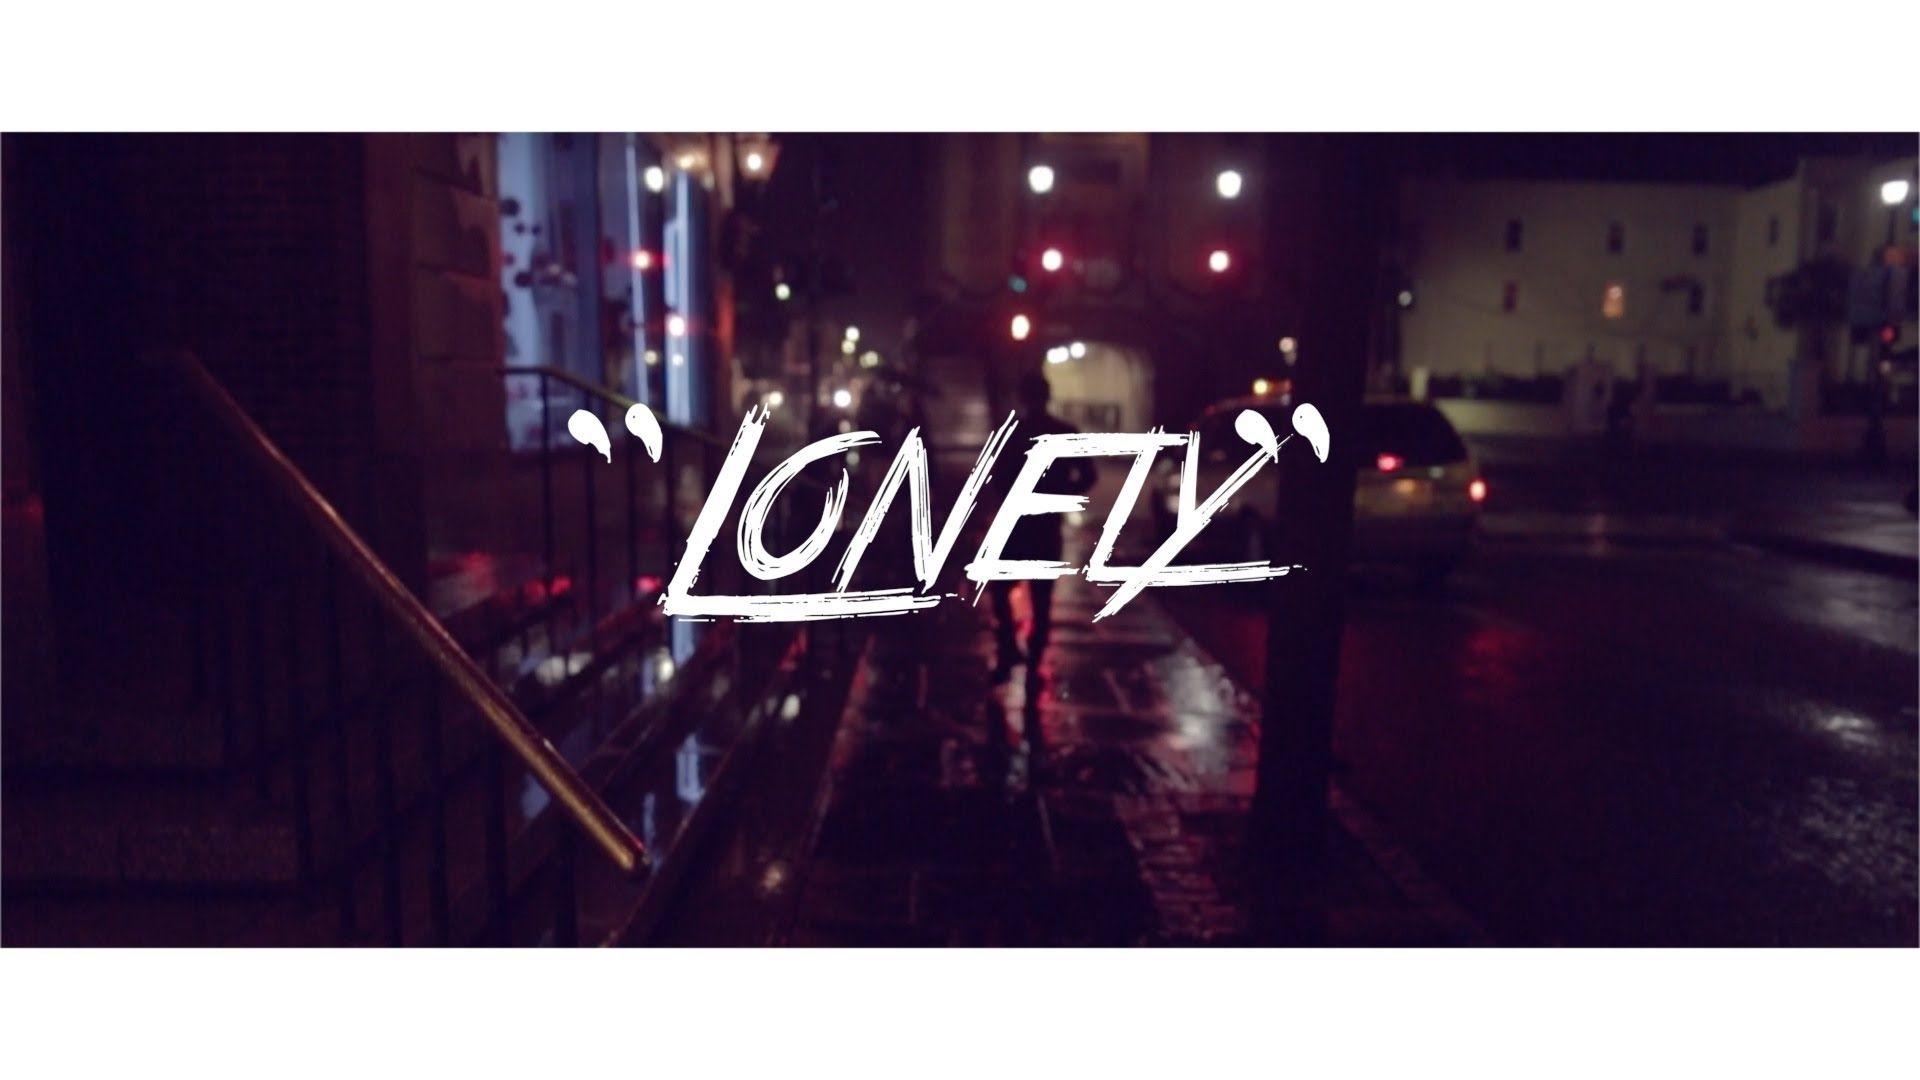 Speaker Knockerz Lonely Shot By Loudvisuals Https Itunes Apple Com Us Album Lonely Id776209011 I 776209014 Speaker Love Songs Songs